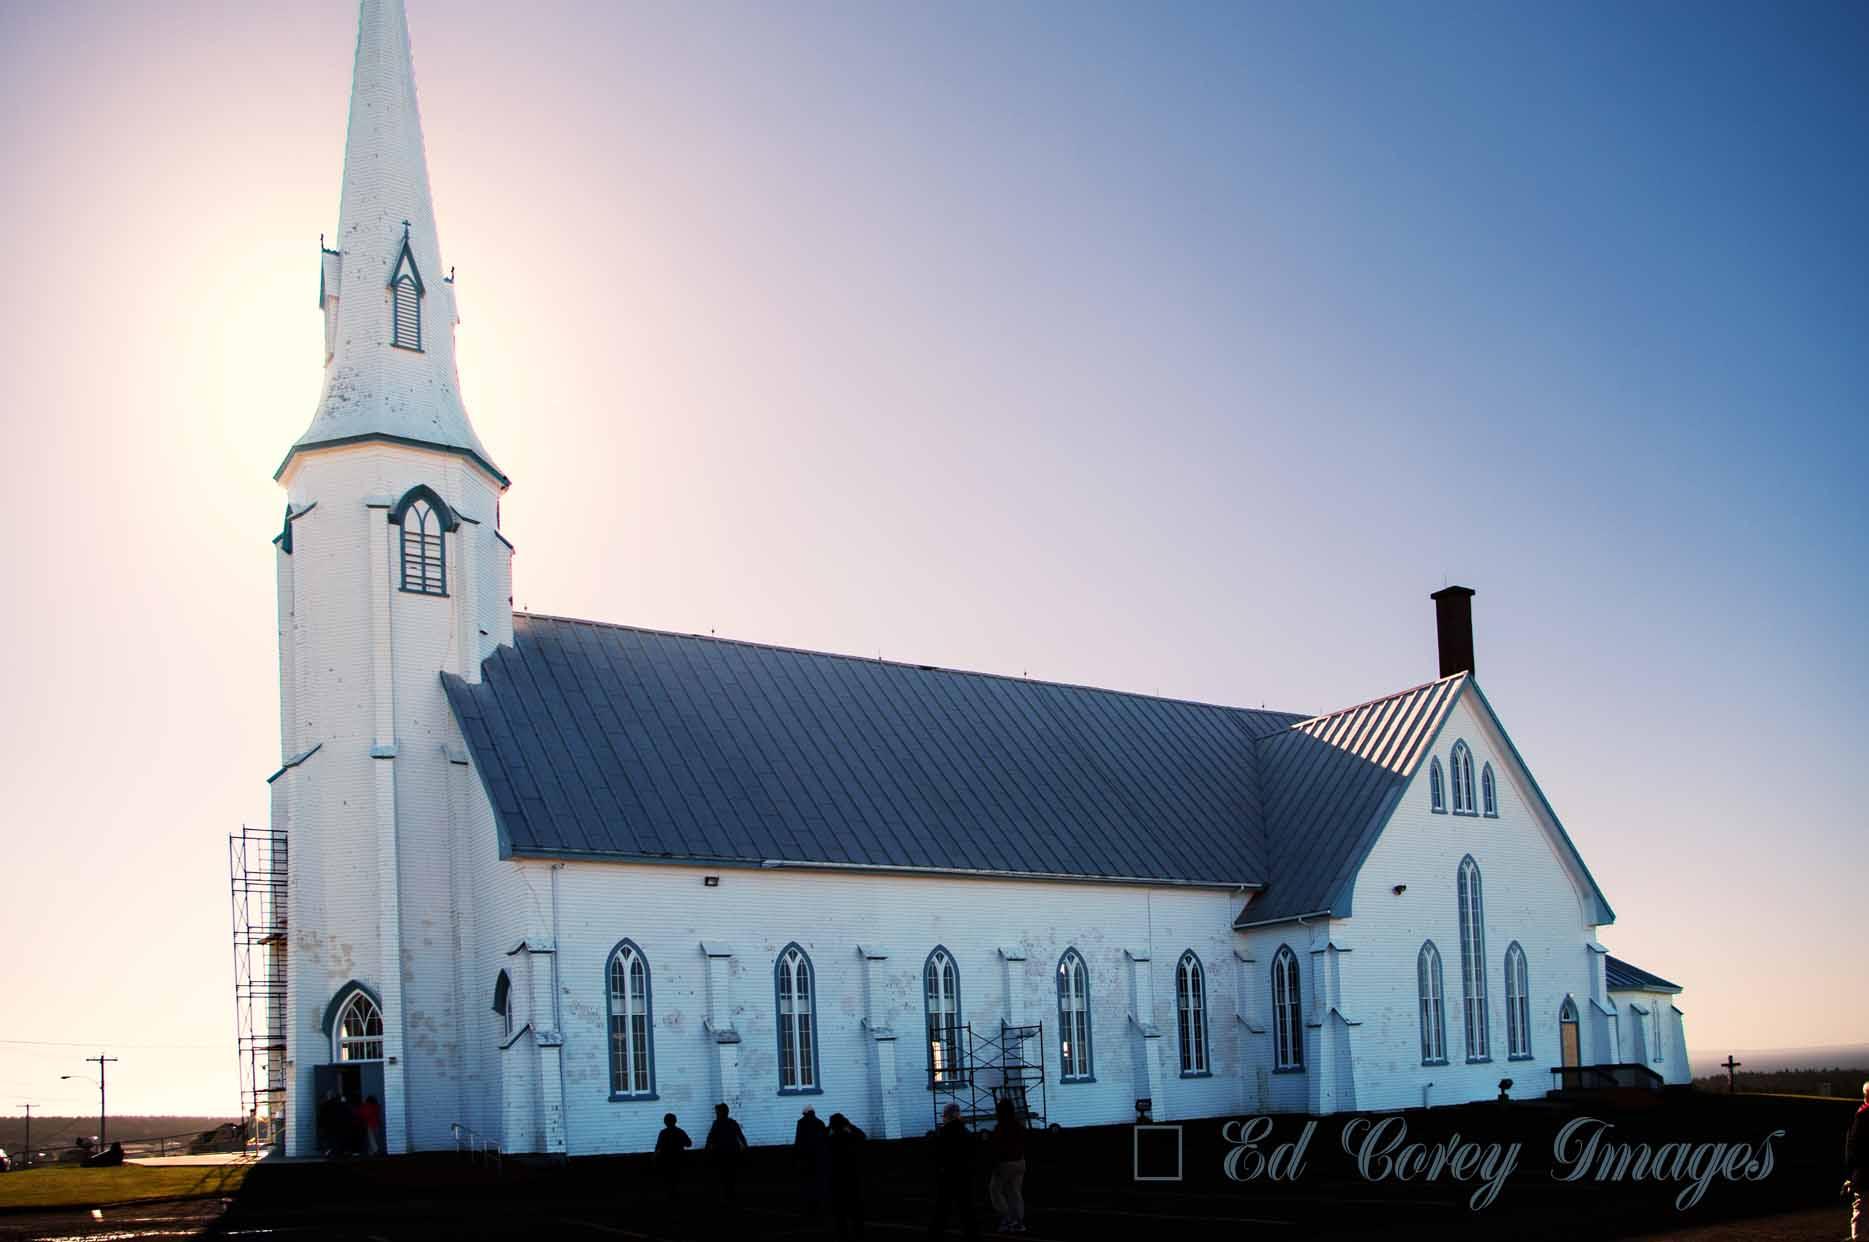 churchs ferry catholic singles Church of st peter harpers ferry,  list: historic catholic churches in usa history: 1833  address: church st, harpers ferry,.